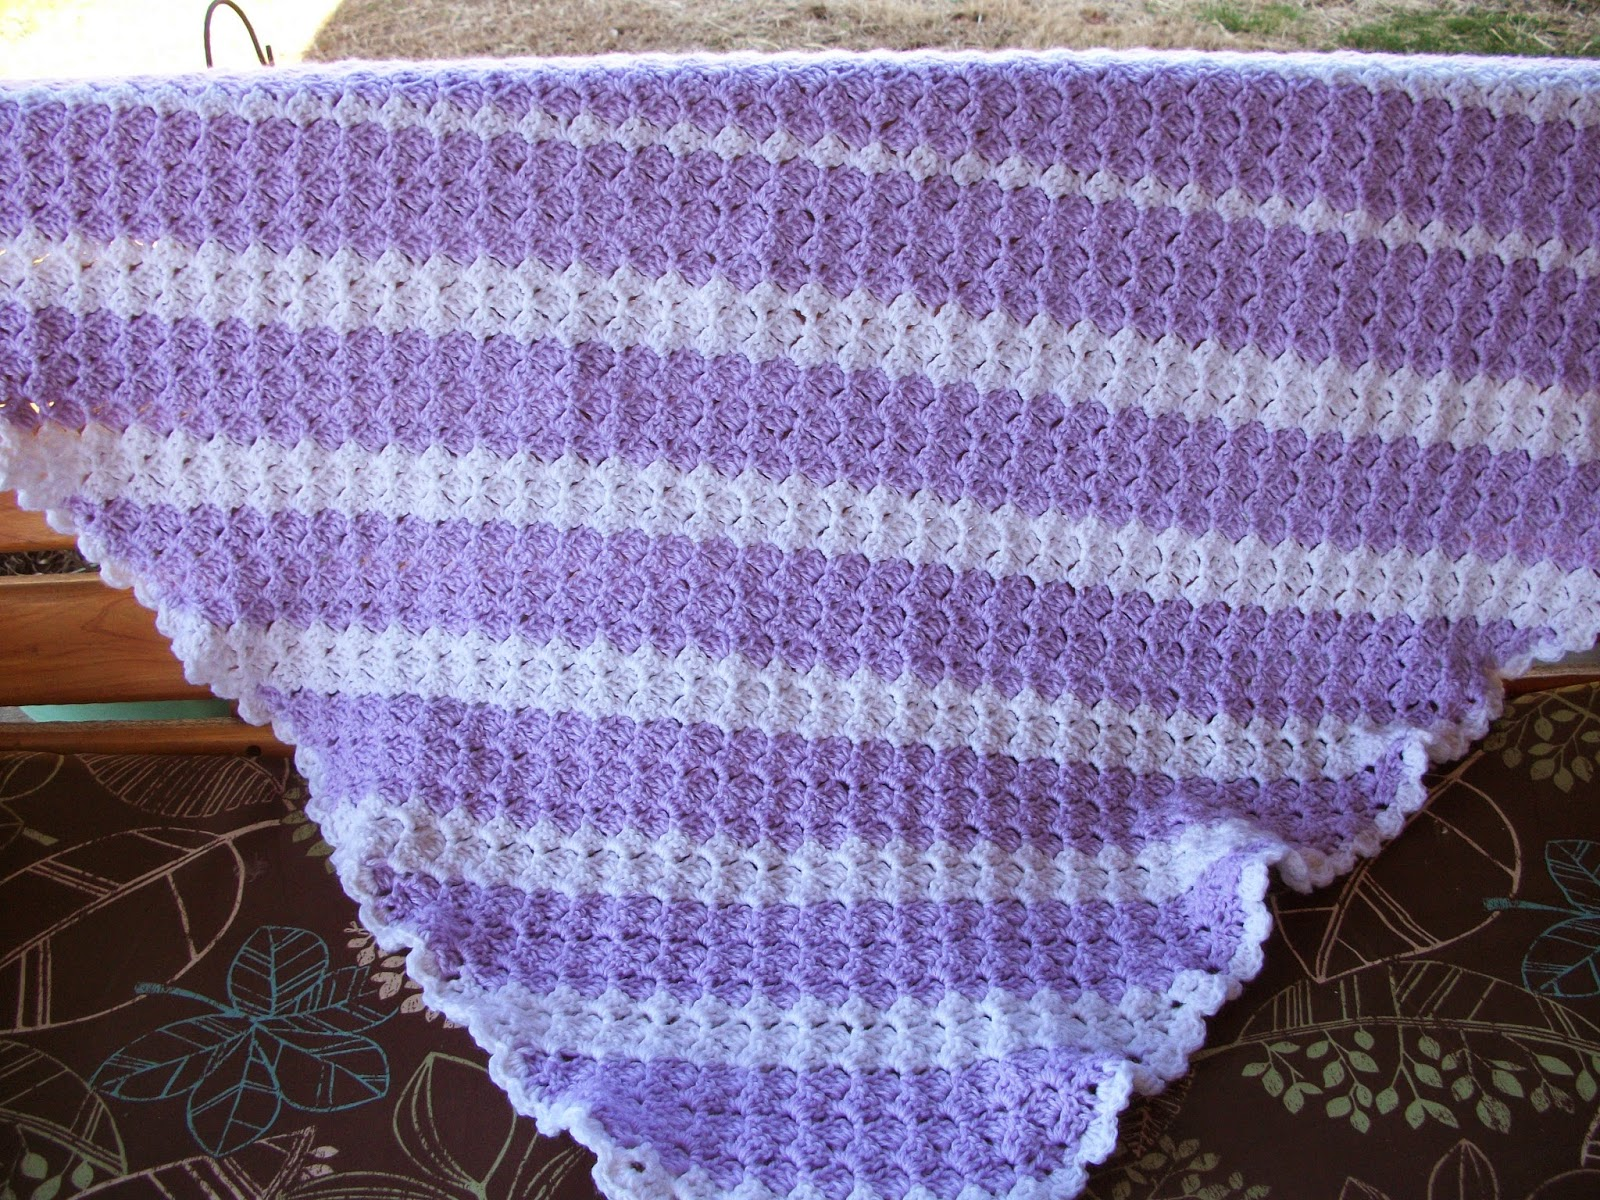 Crocheting C2c : KATHYS CROCHET CABIN: C2C BLANKET